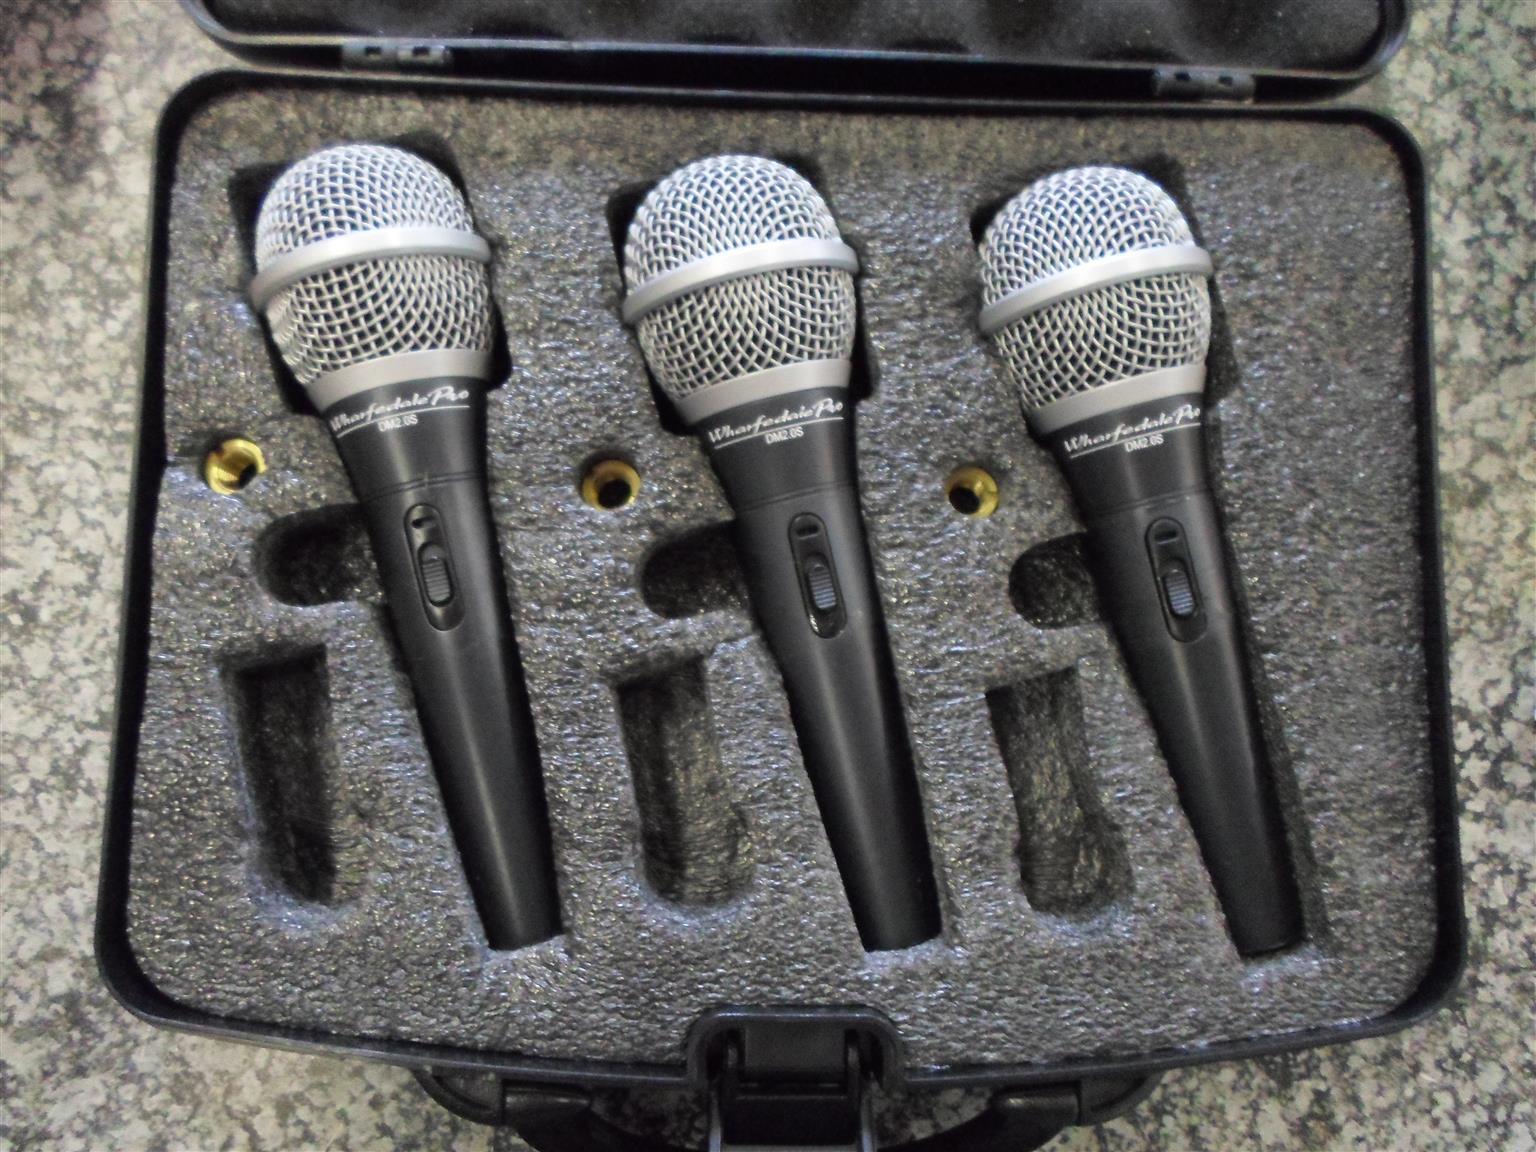 3x Wharfedale Pro DM2.0S Microphones